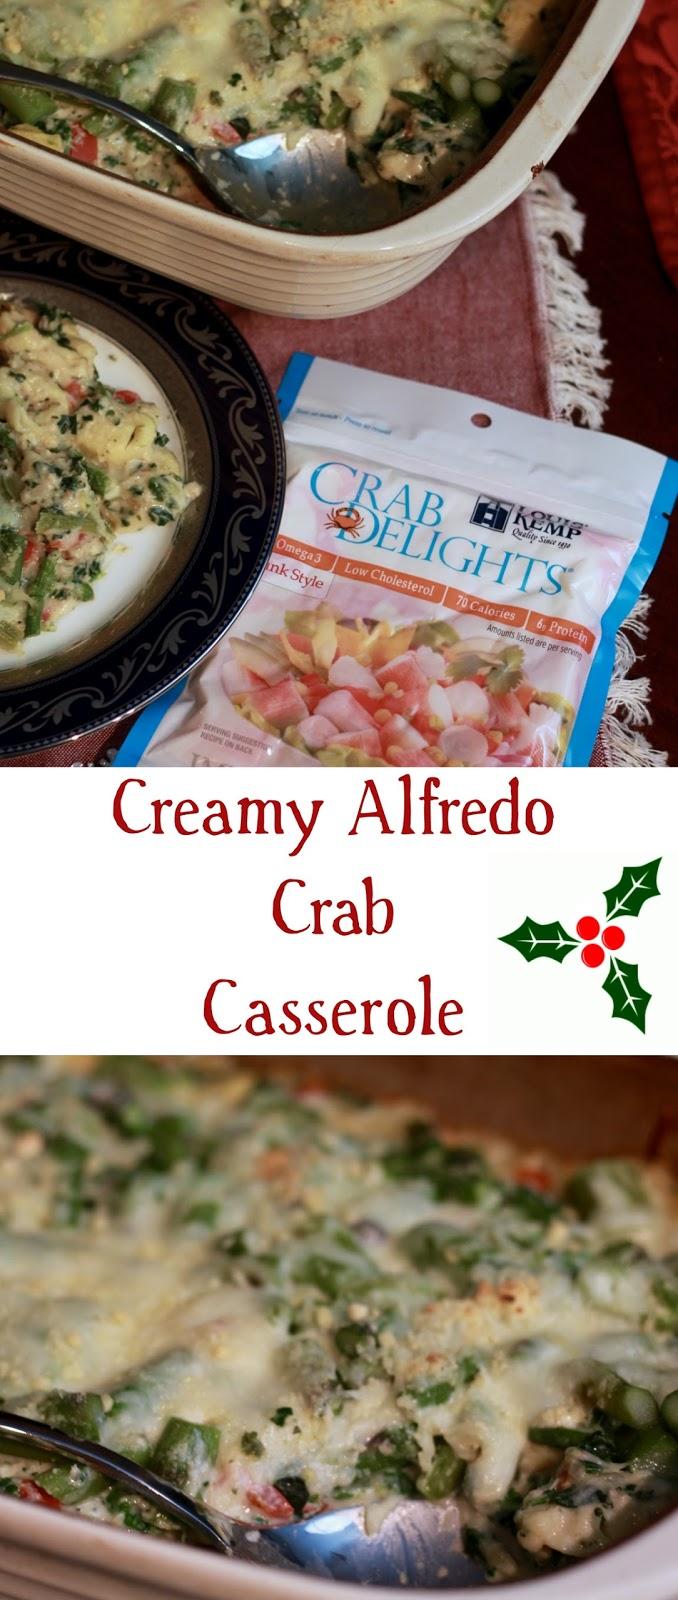 Creamy Alfredo Crab Casserole, Louis Kemp Crab Delights, crab tortellini casserole